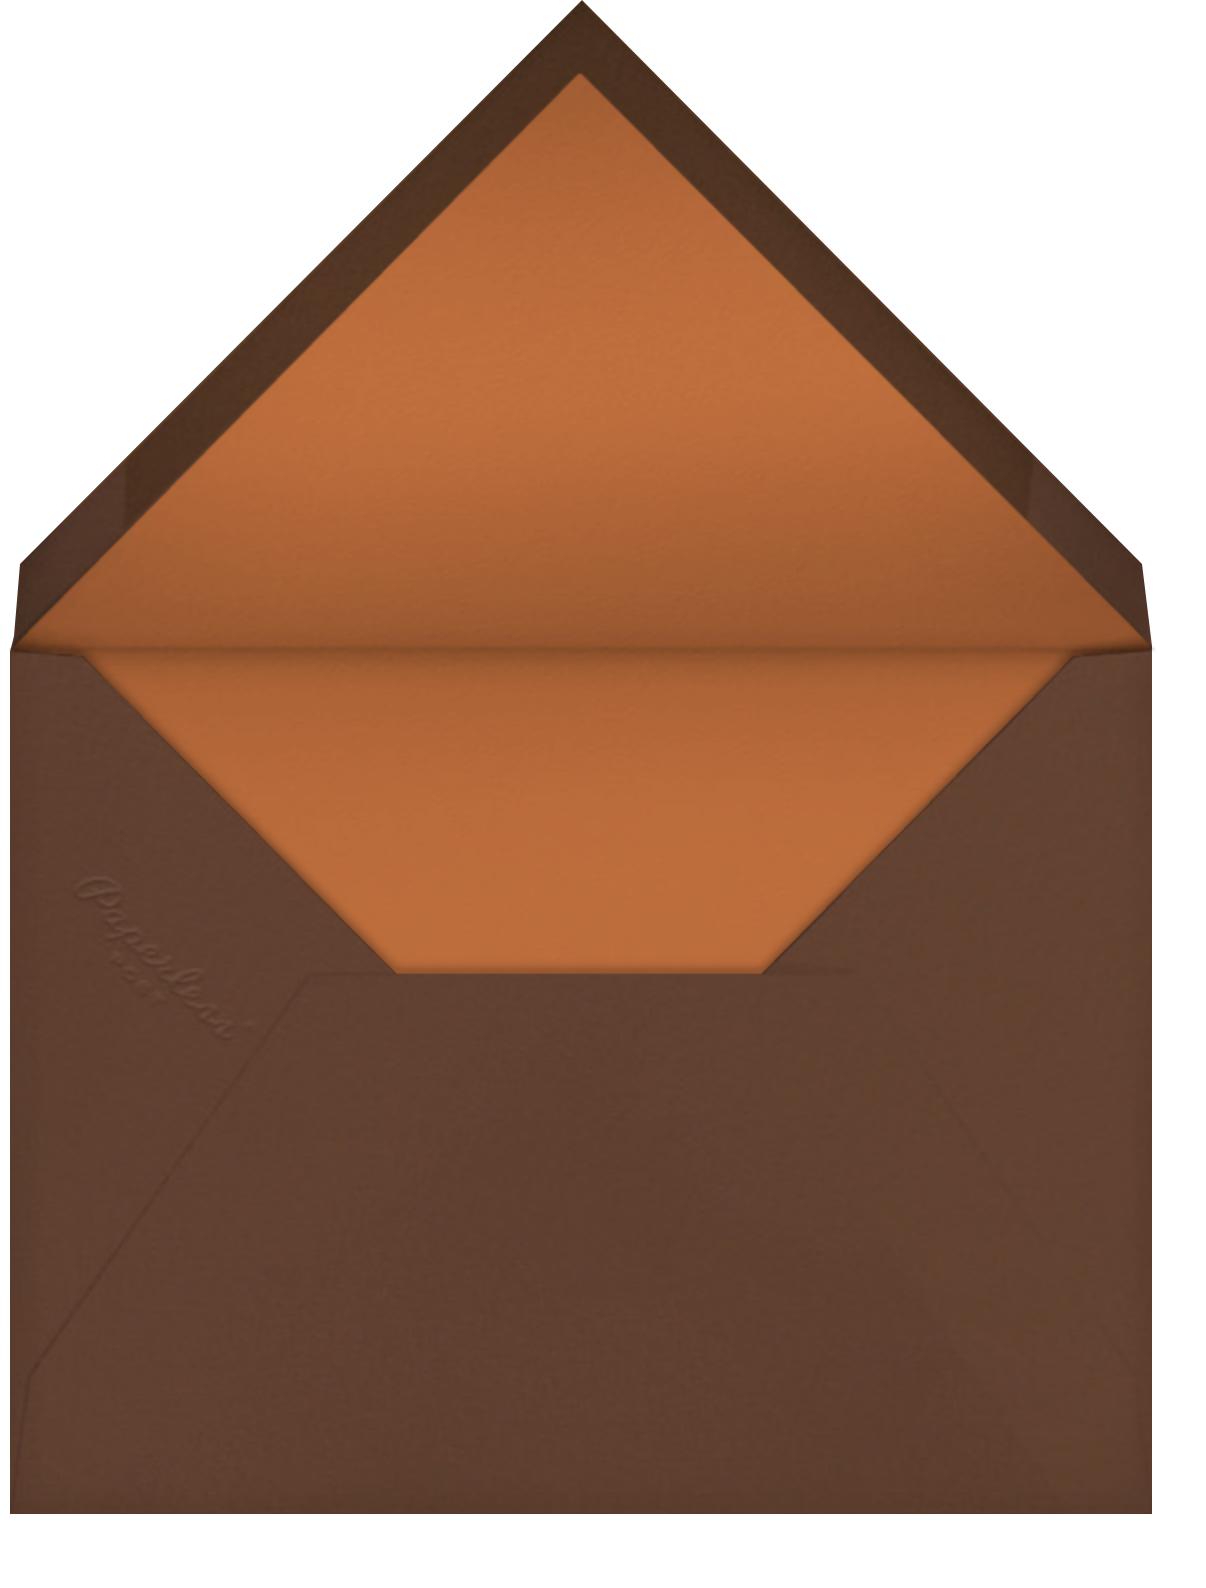 Fern II (Invitation) - Pumpkin - Paperless Post - All - envelope back